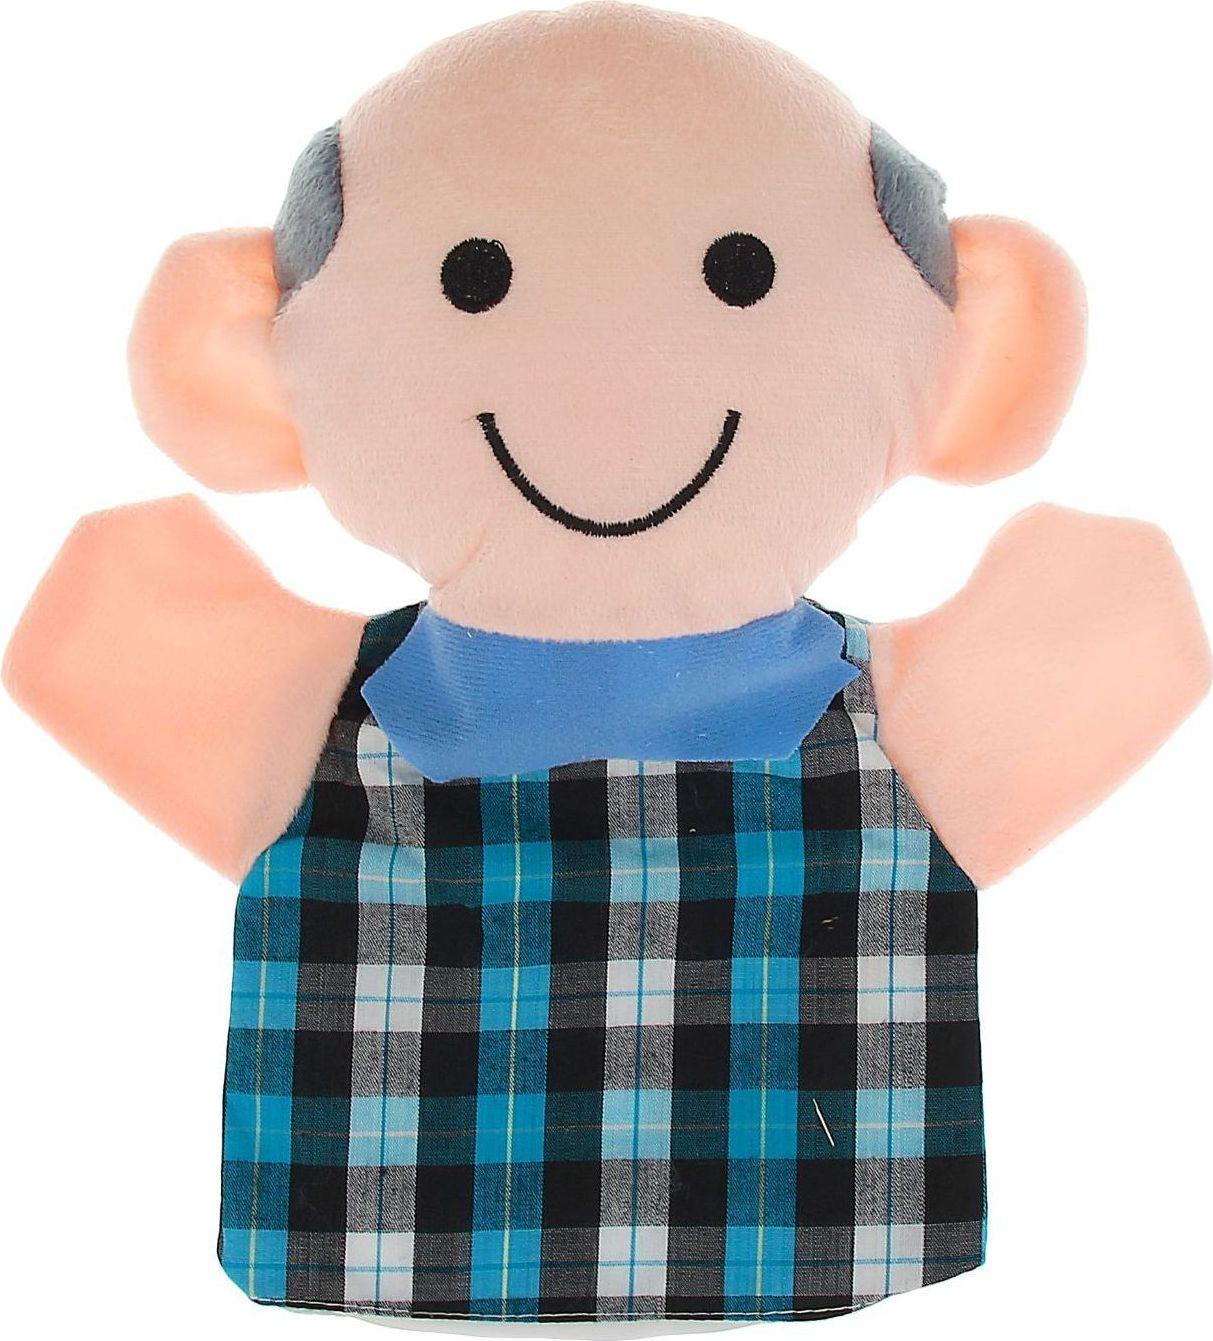 Sima-land Мягкая игрушка на руку Дедушка 1147837 sima land мягкая игрушка на руку мальчик 1147835